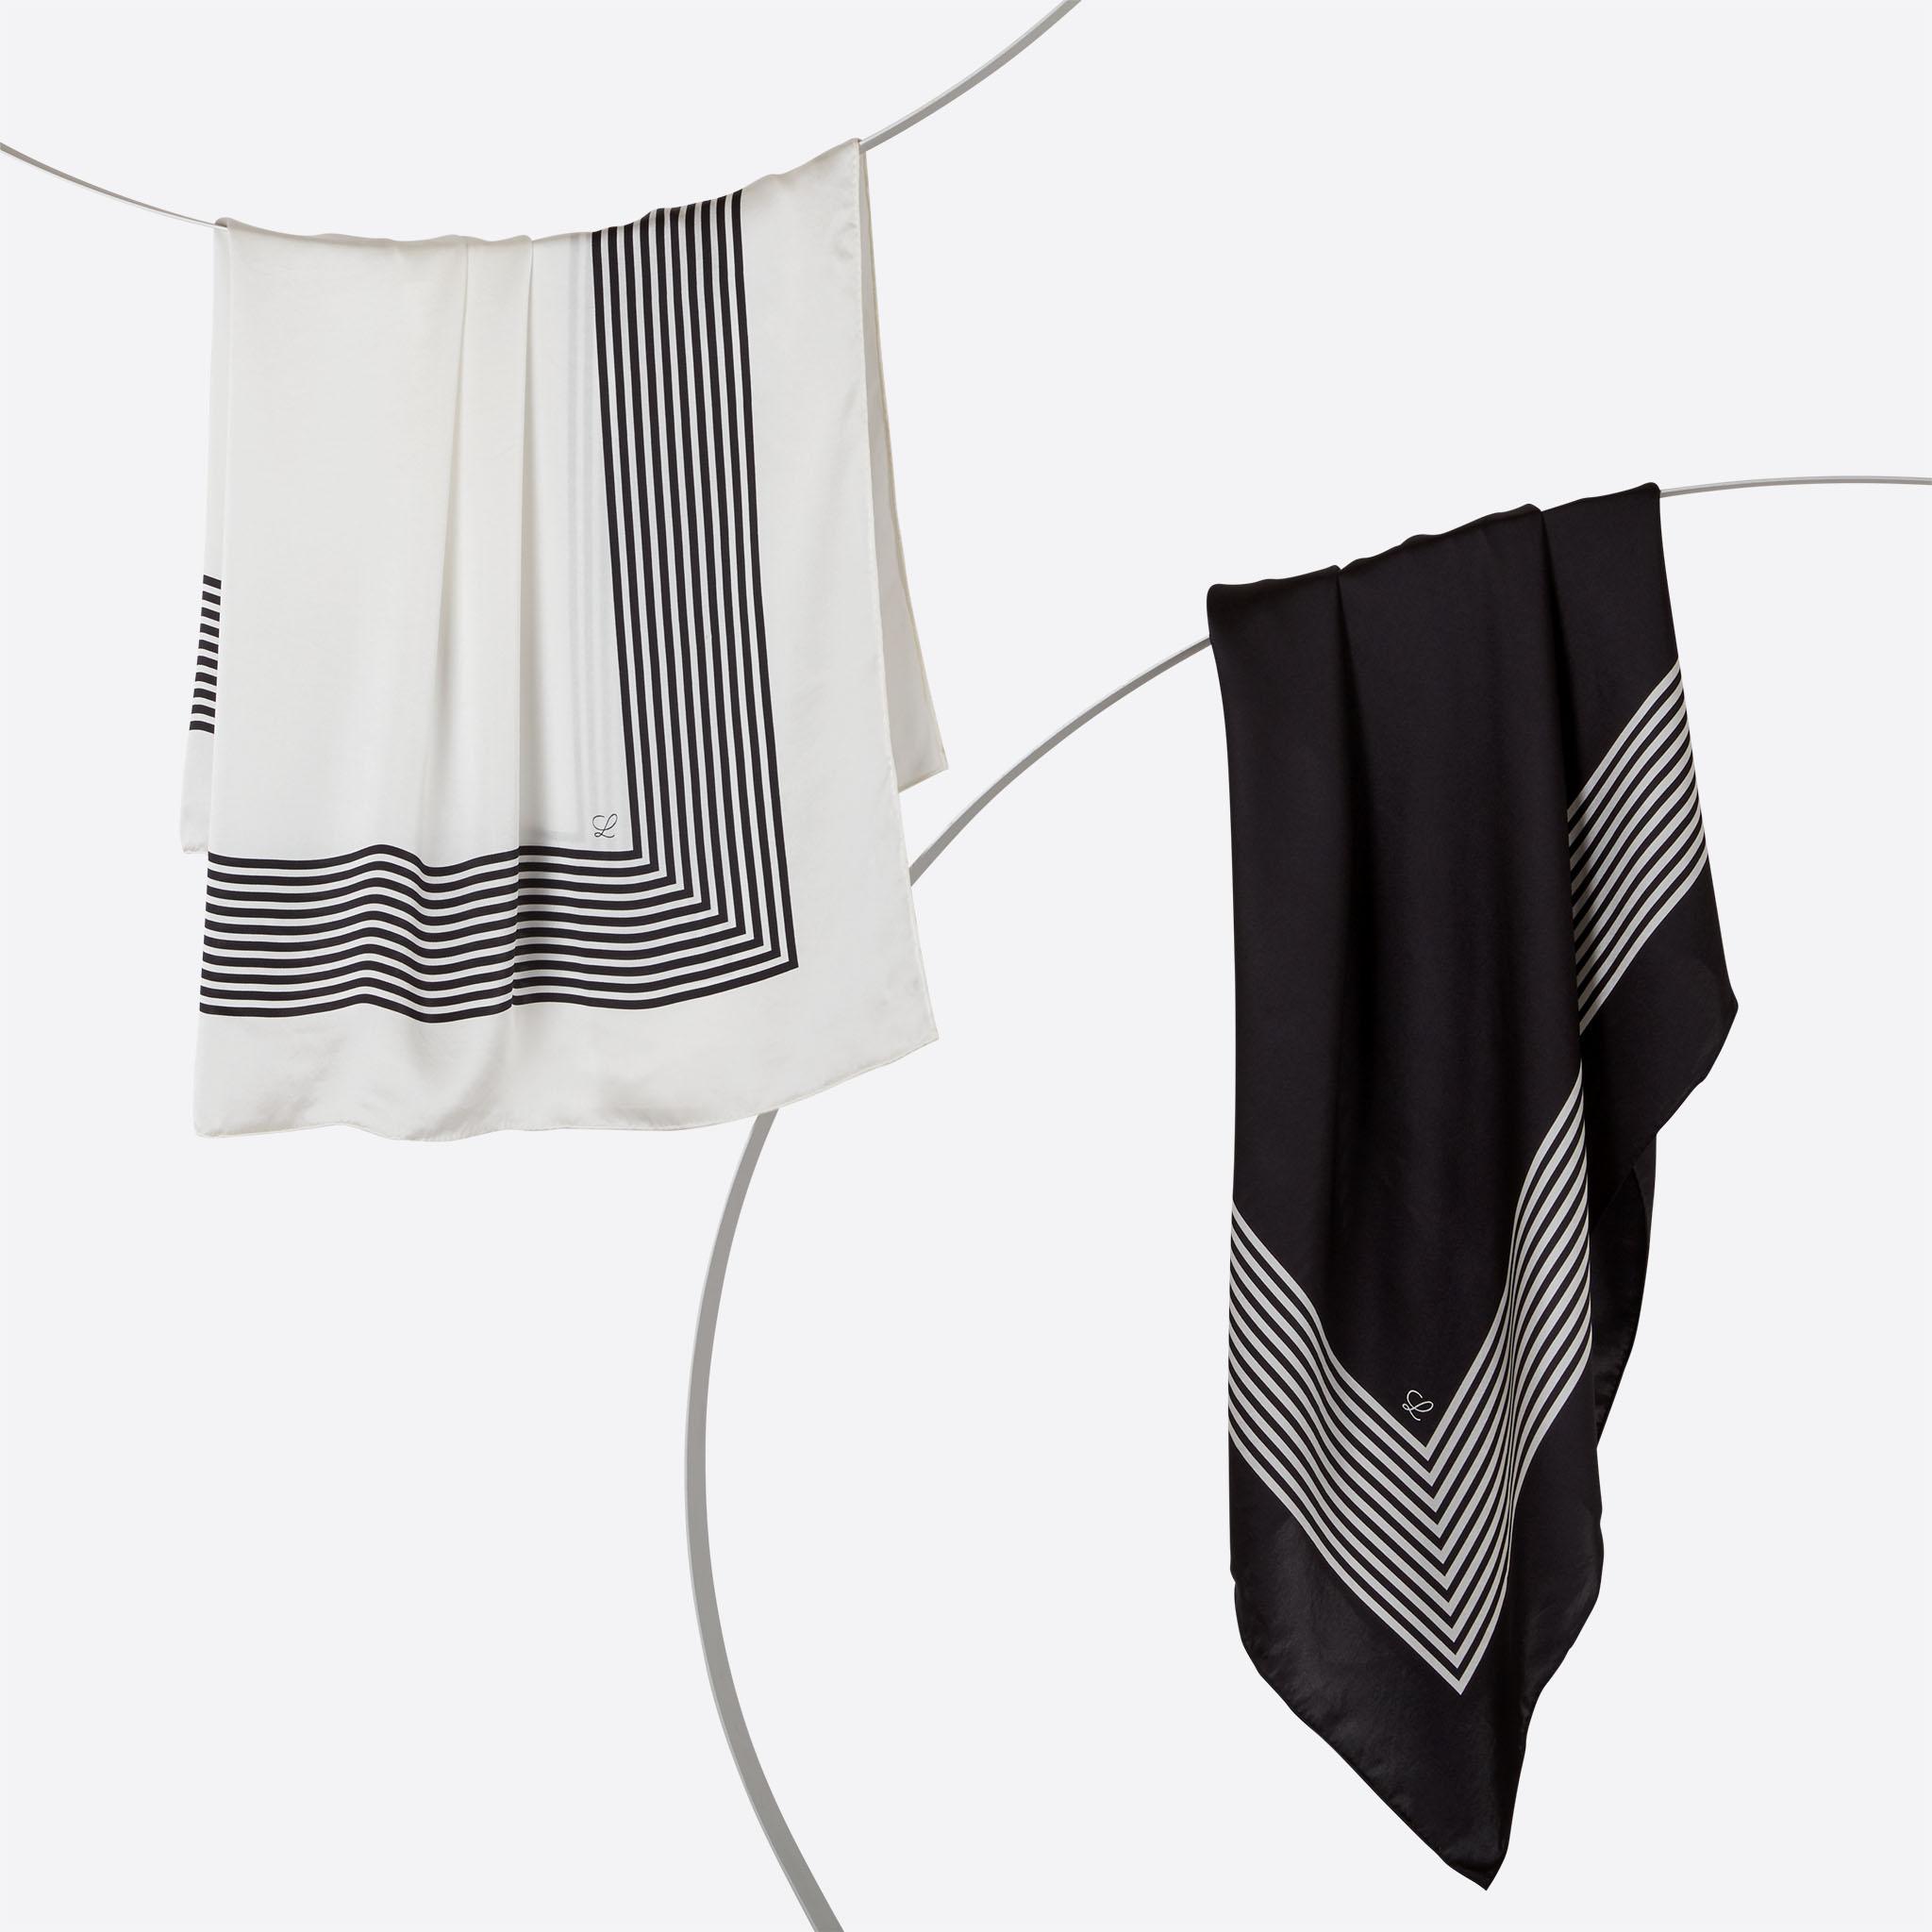 Lalouette white and black striped square silk scarves